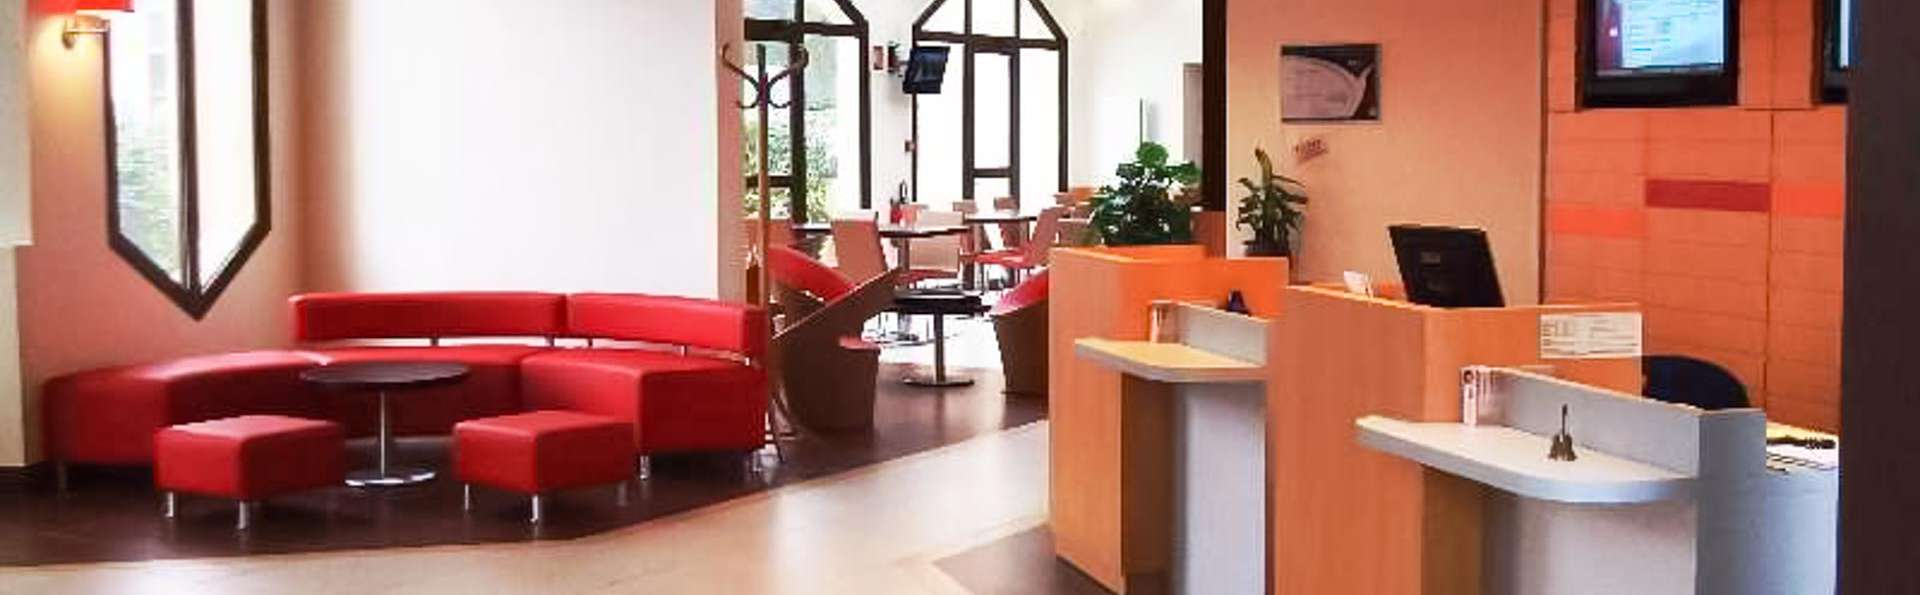 Hôtel Ibis Saint Lo La Chevalerie - EDIT_LOBBY_01.jpg